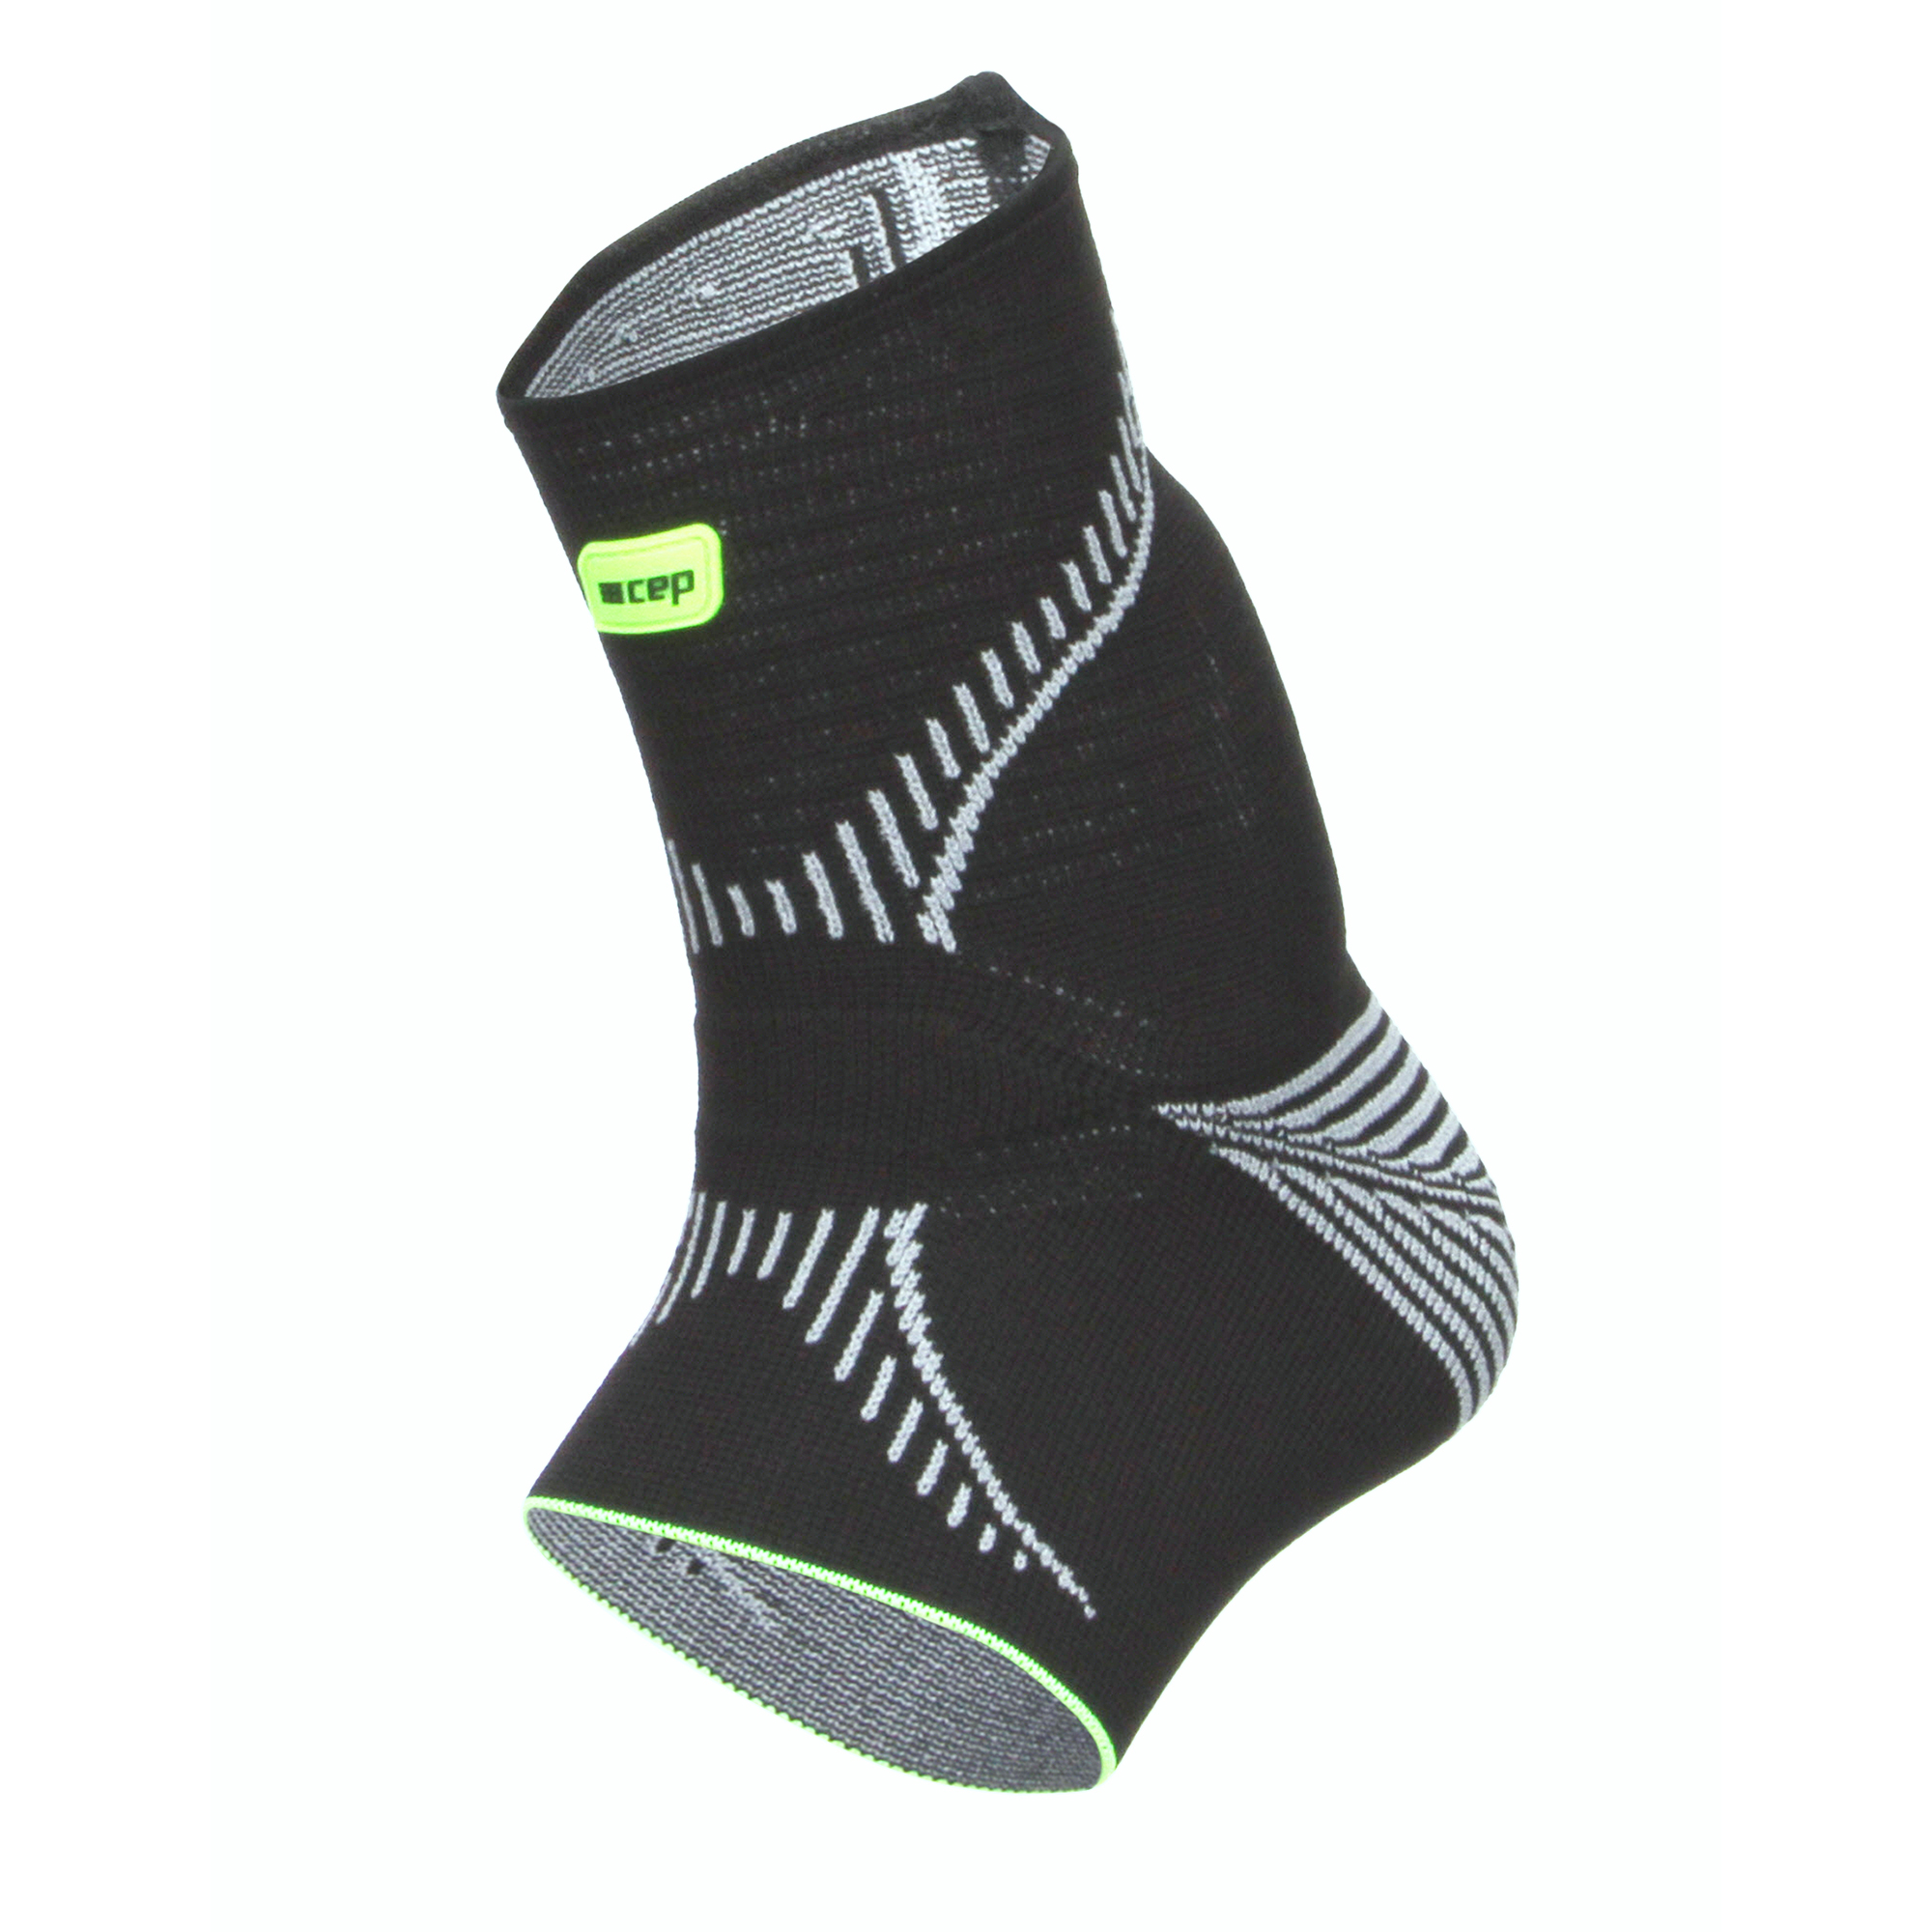 f5615c31c3 CEP Ortho+ Achilles Brace Black-Green Size 2 4049772031566 | eBay